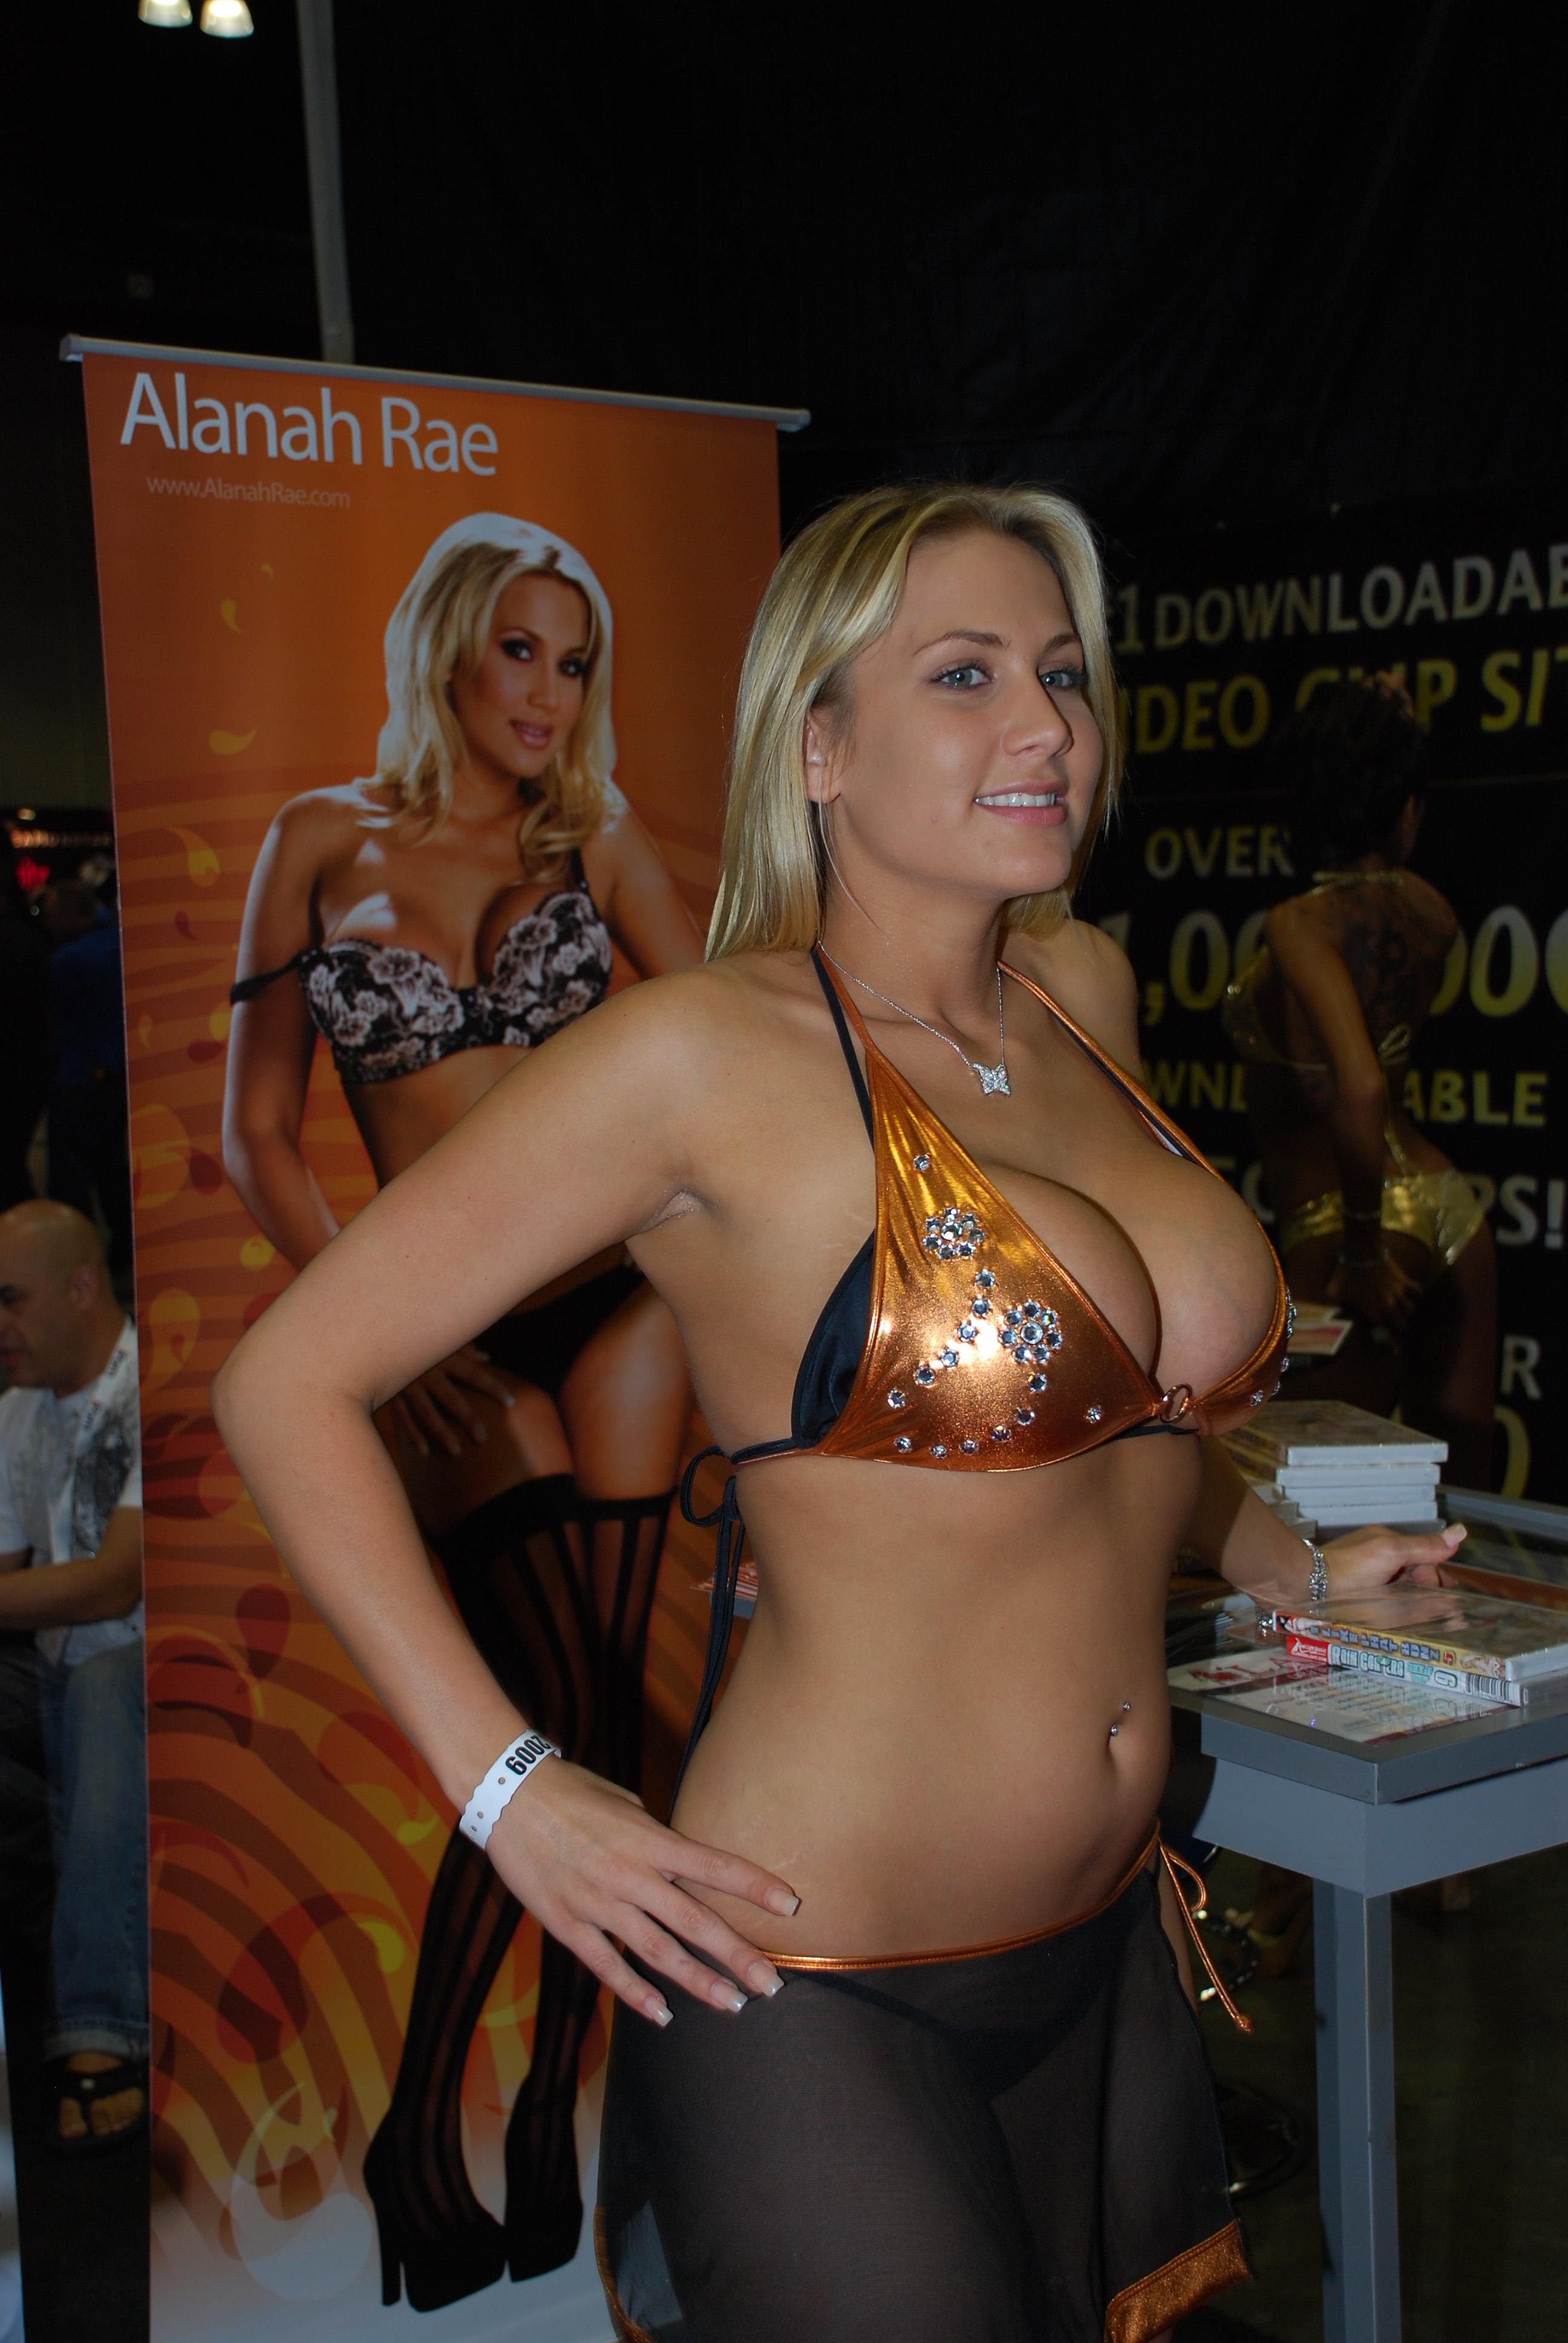 Alanah Rae Porn Star Real Name alanah rae - busty blonde female porn star & glamour model